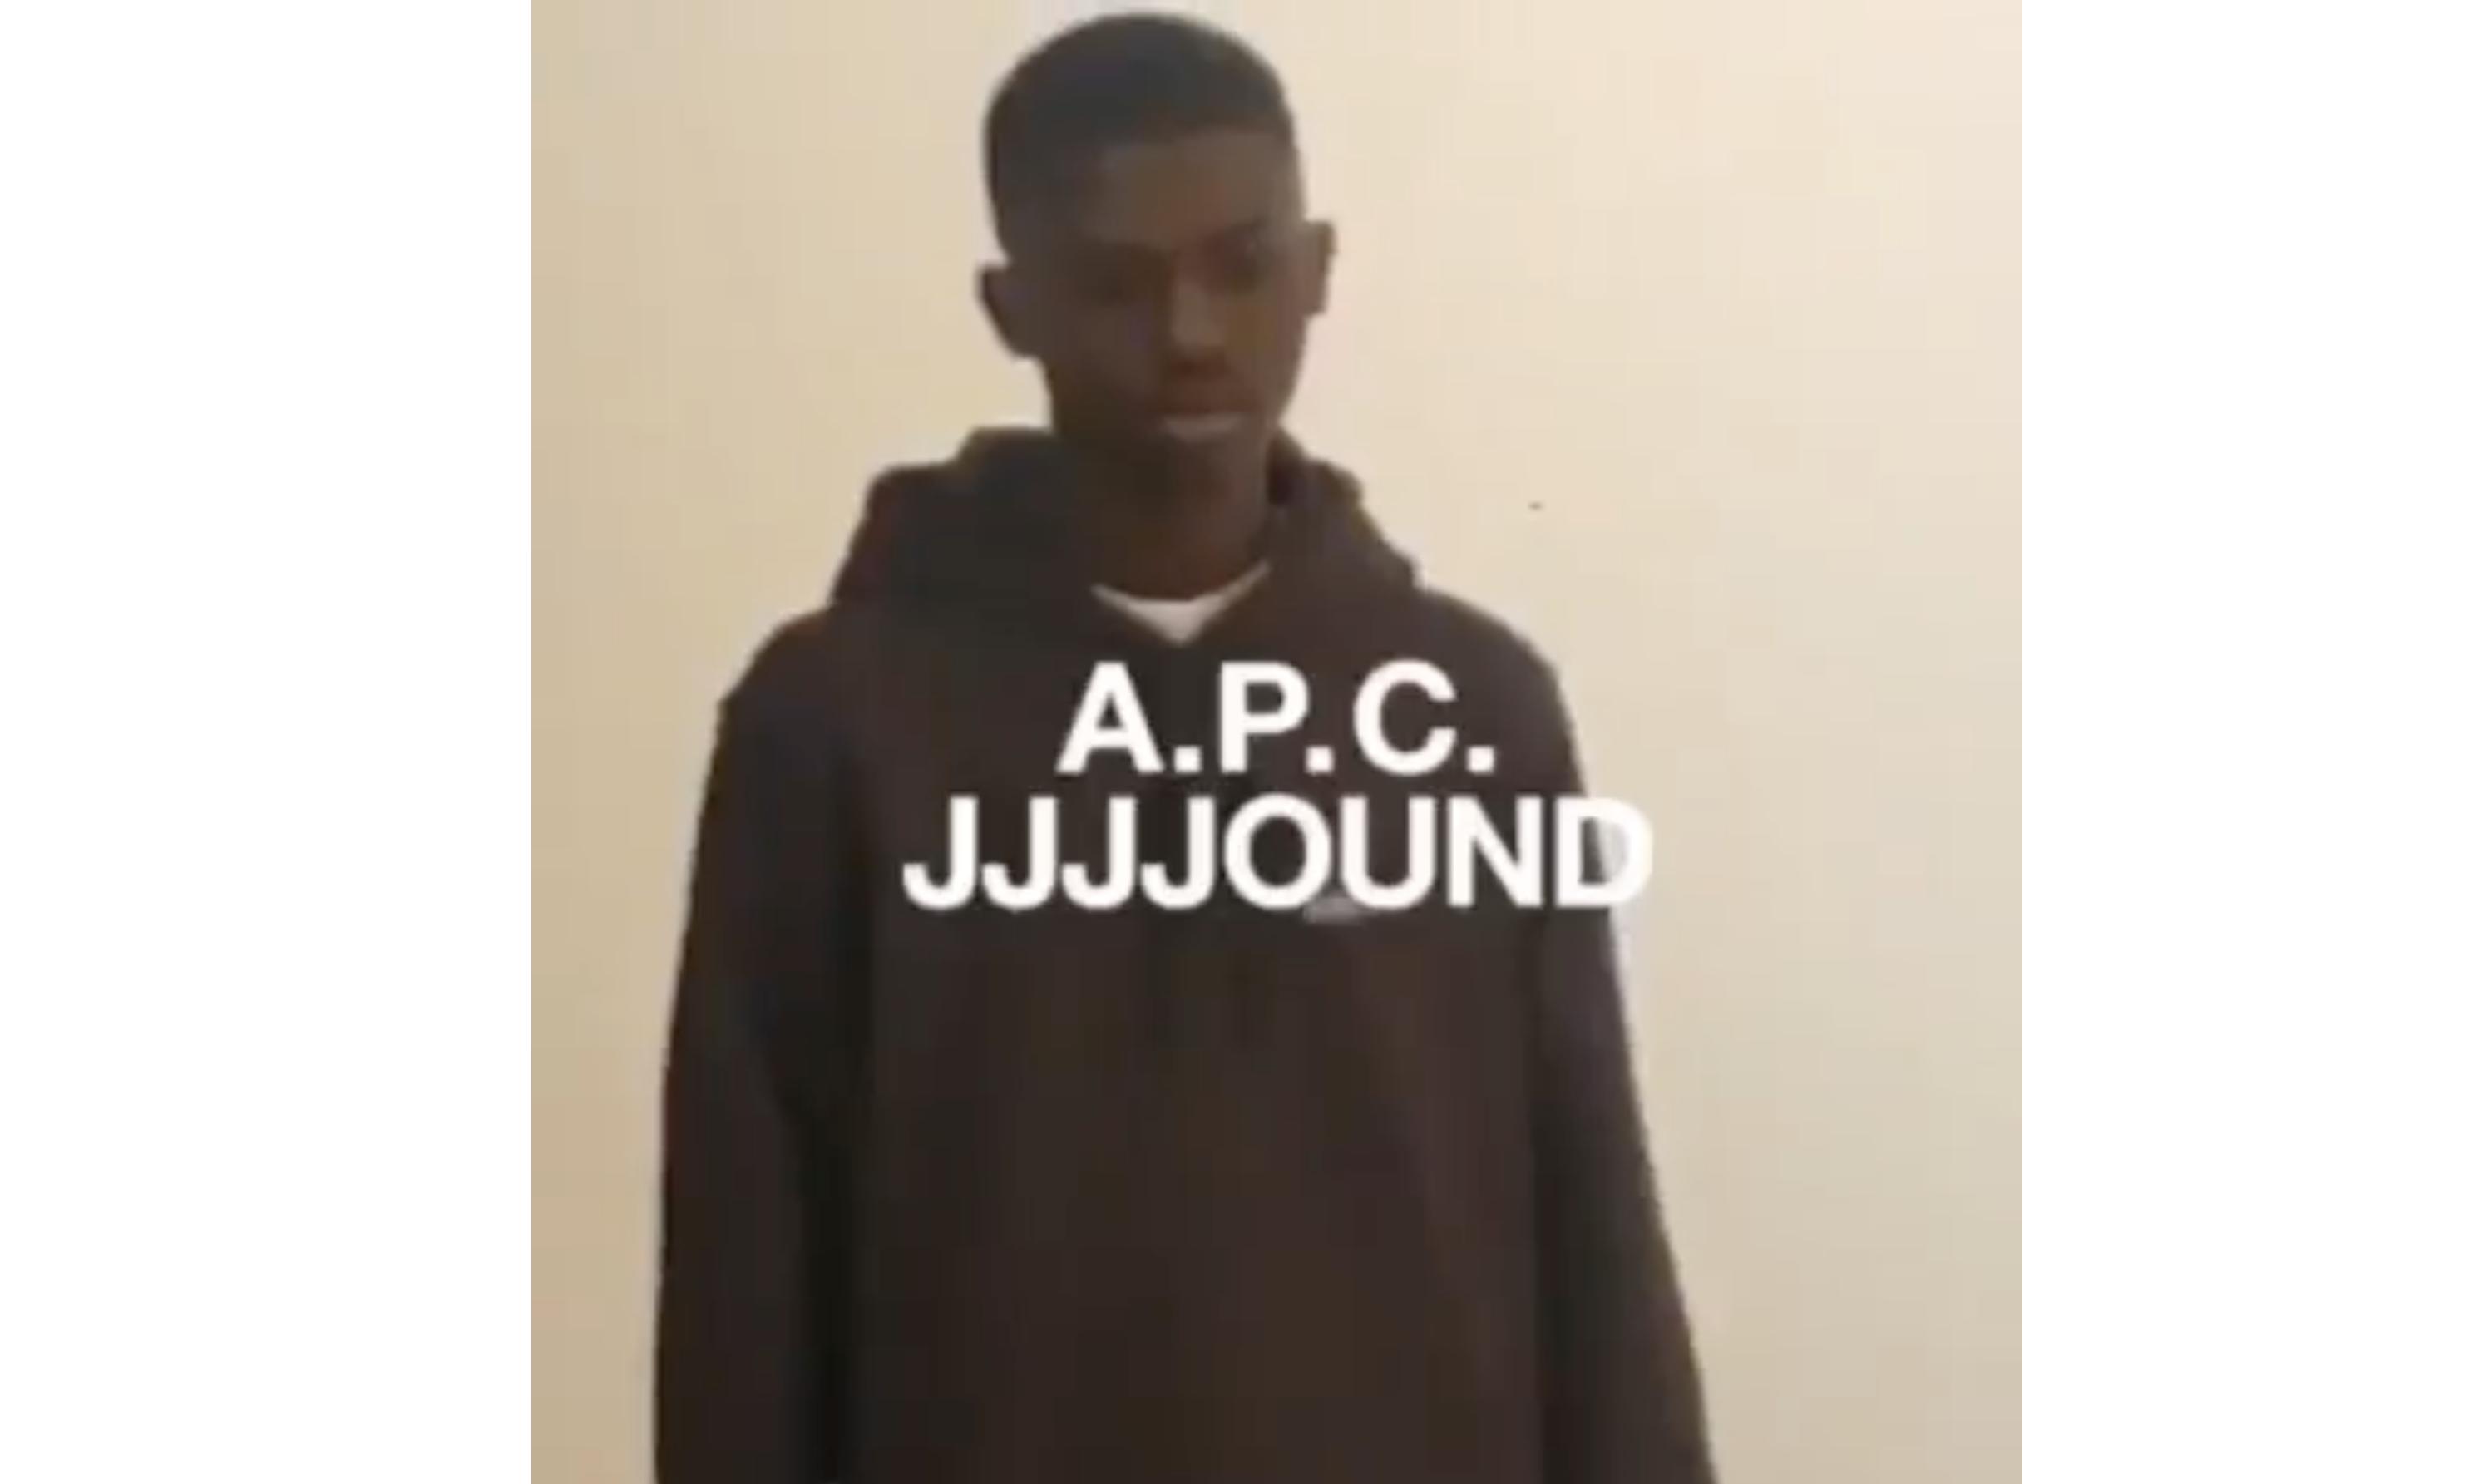 JJJJound x A.P.C. 联名系列预告片释出